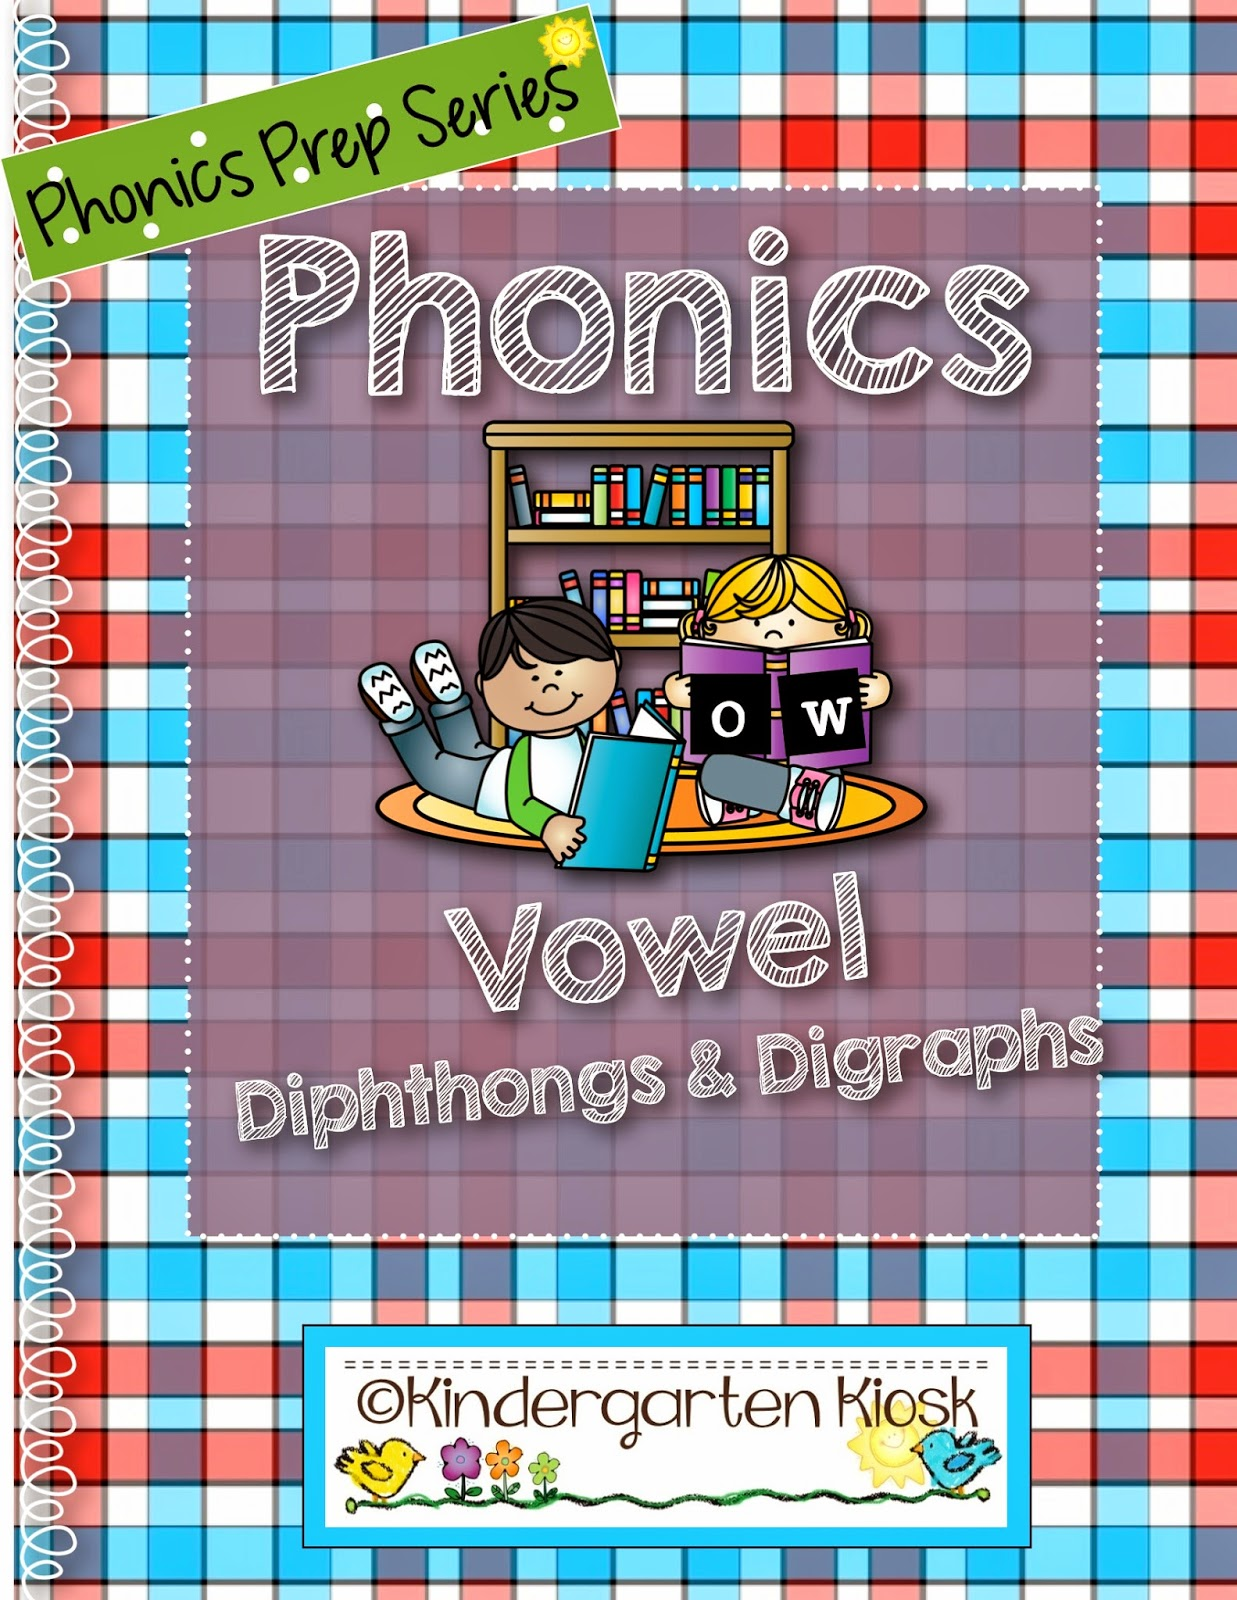 Kindergarten Kiosk Phonics Prep Vowel Digraphs And Diphtongs